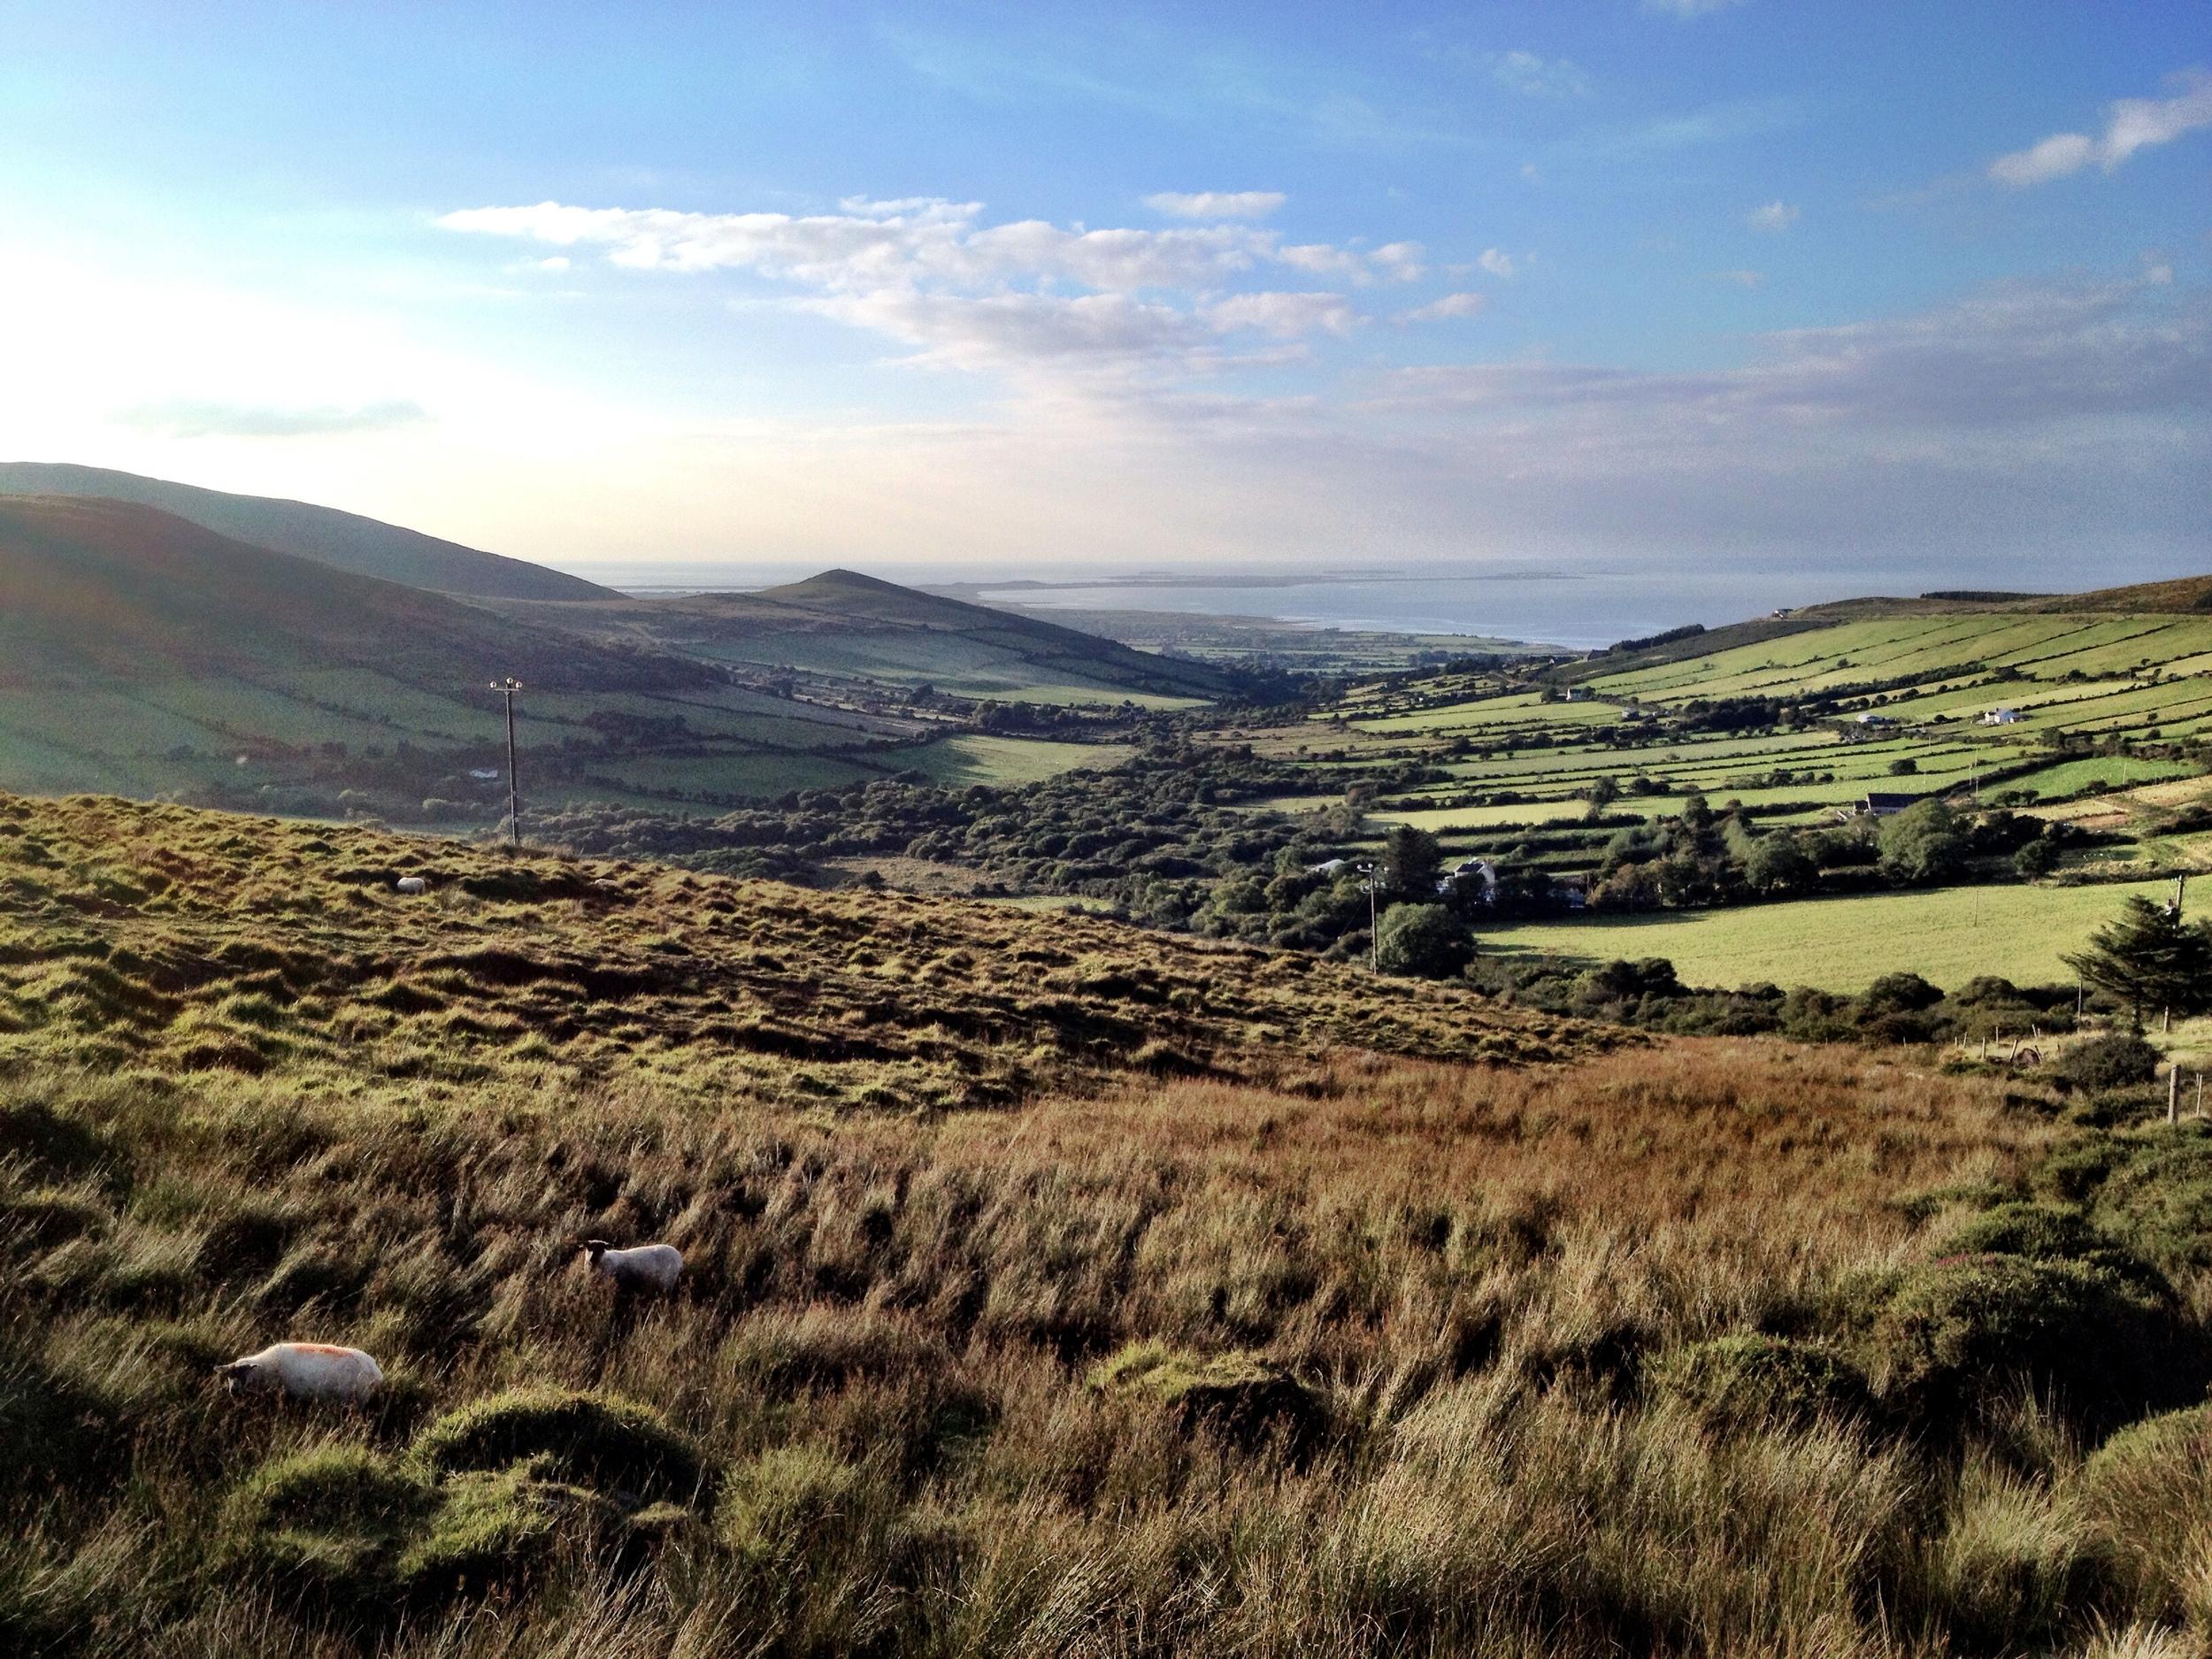 Driving through the Irish countryside.